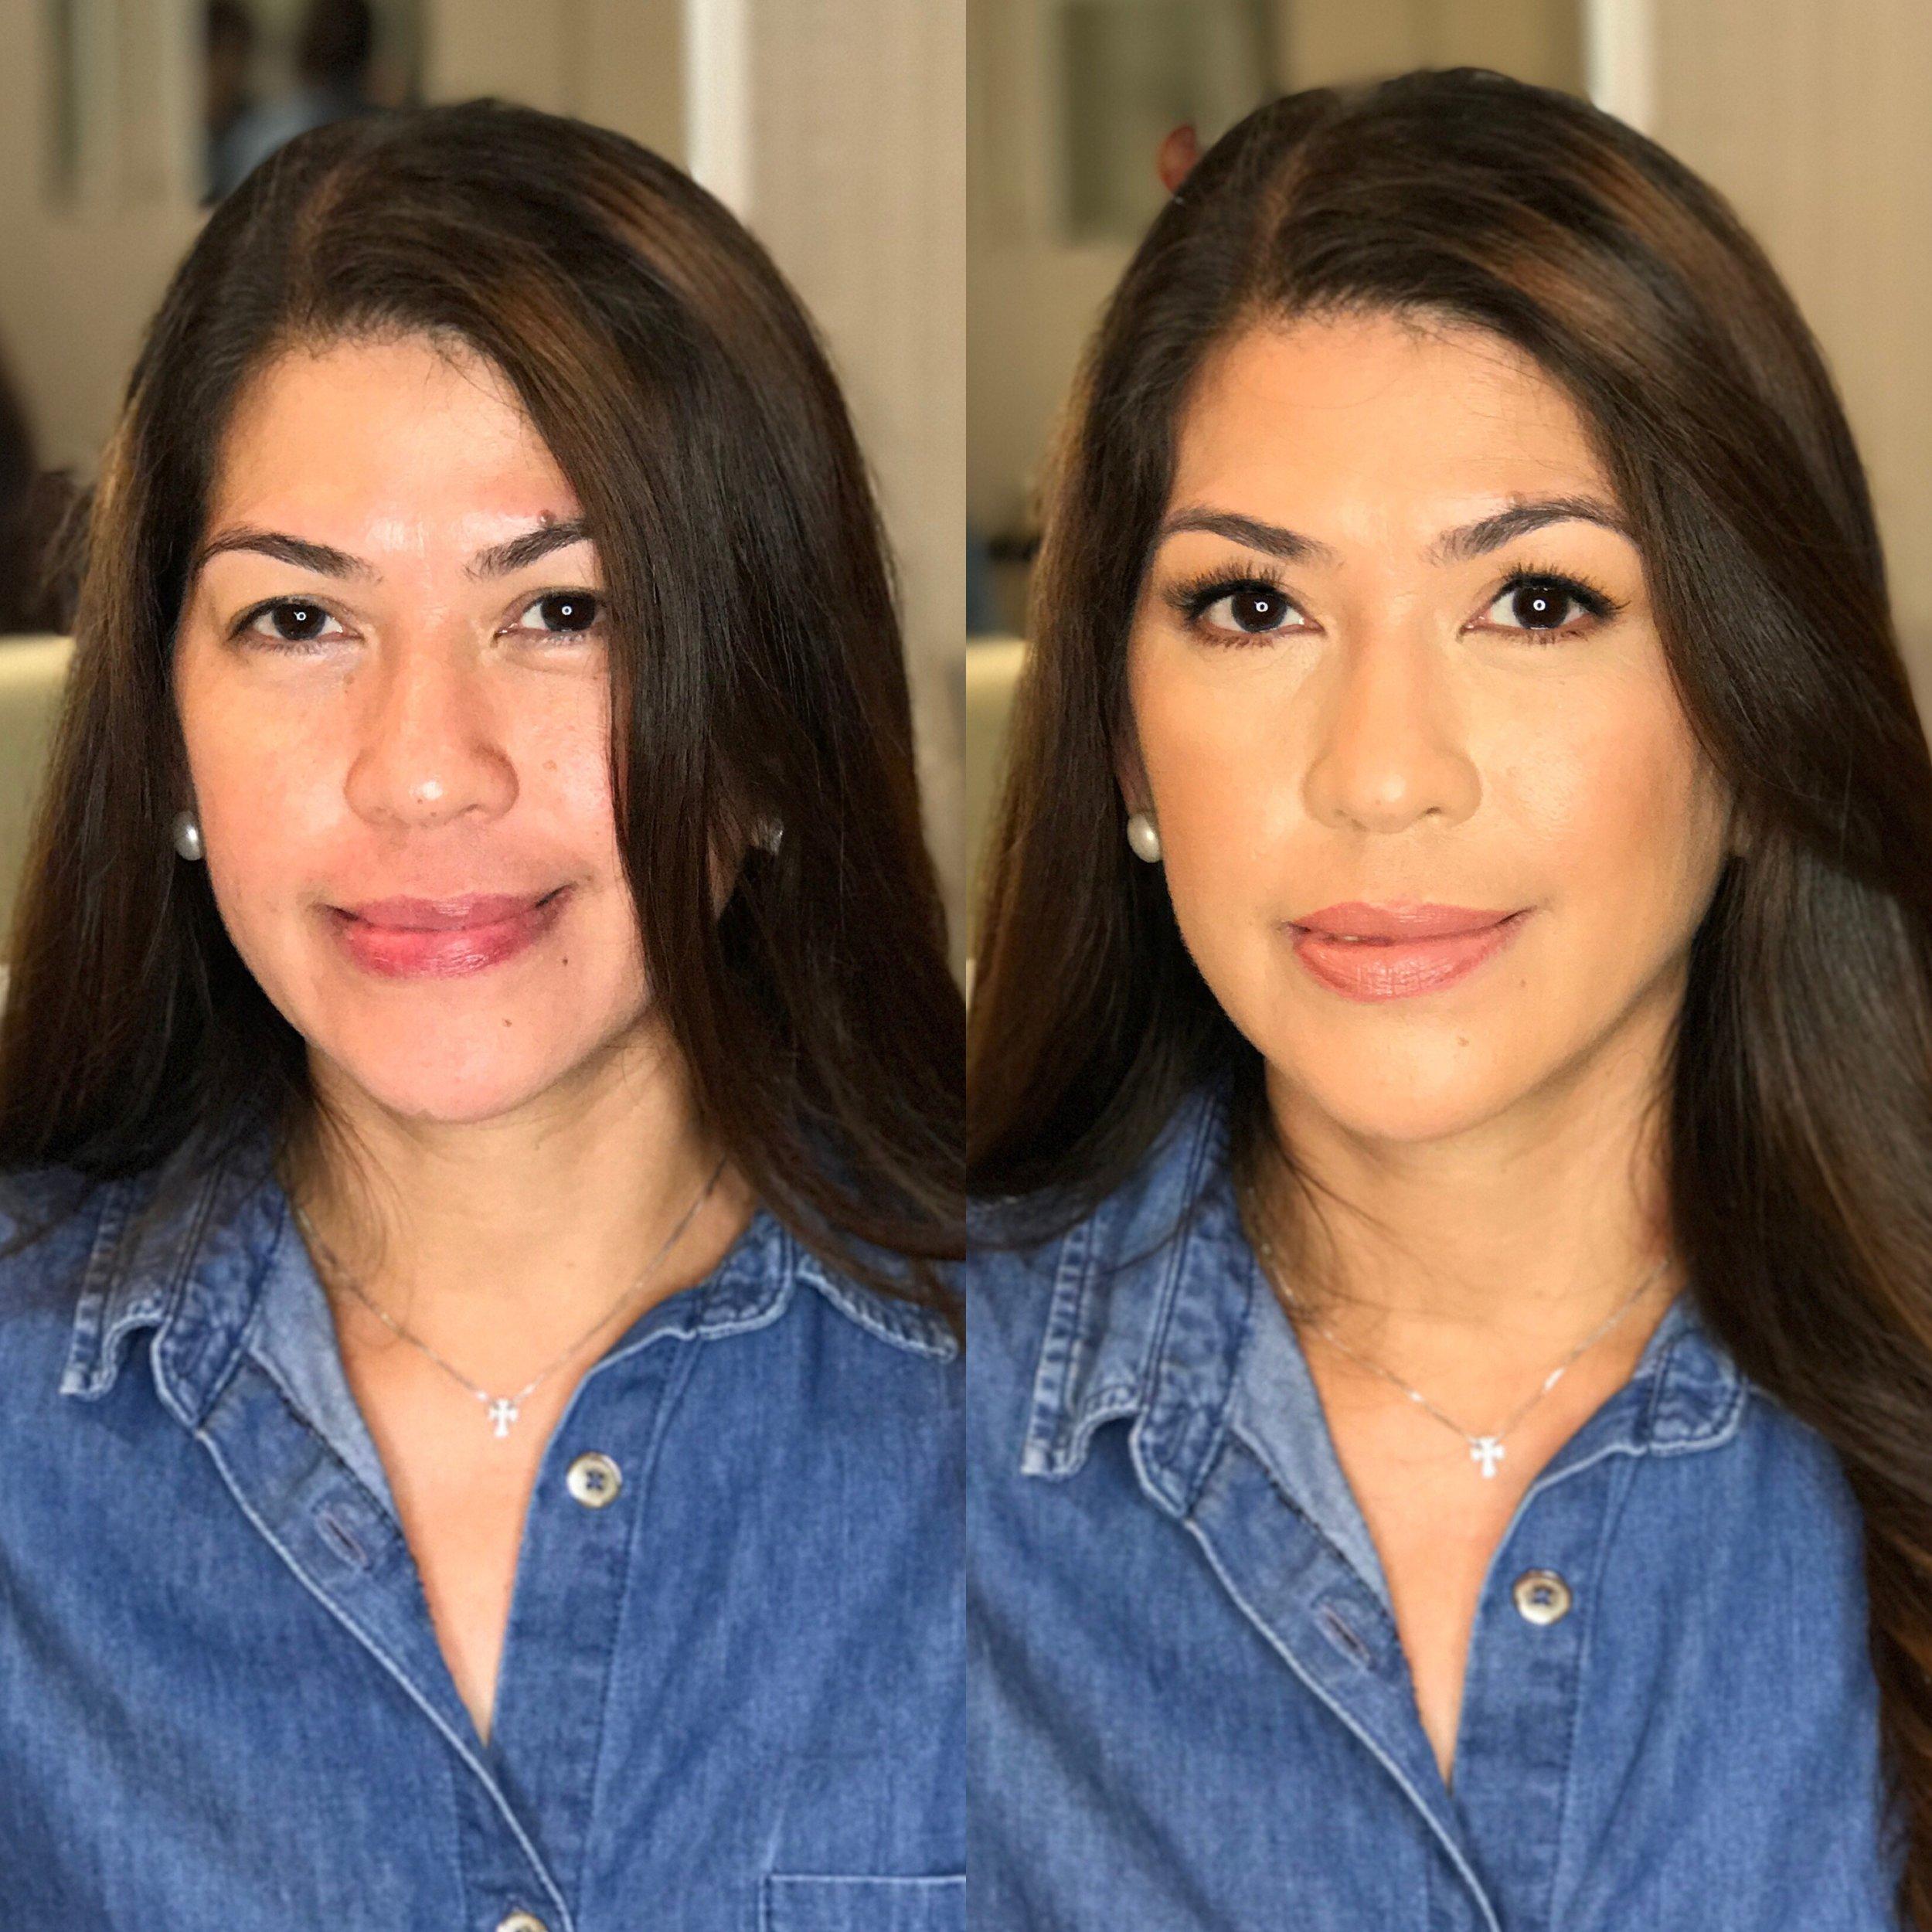 Patricia_Castro_Makeup_Los_Angeles_Makeup_Artist_54.JPG